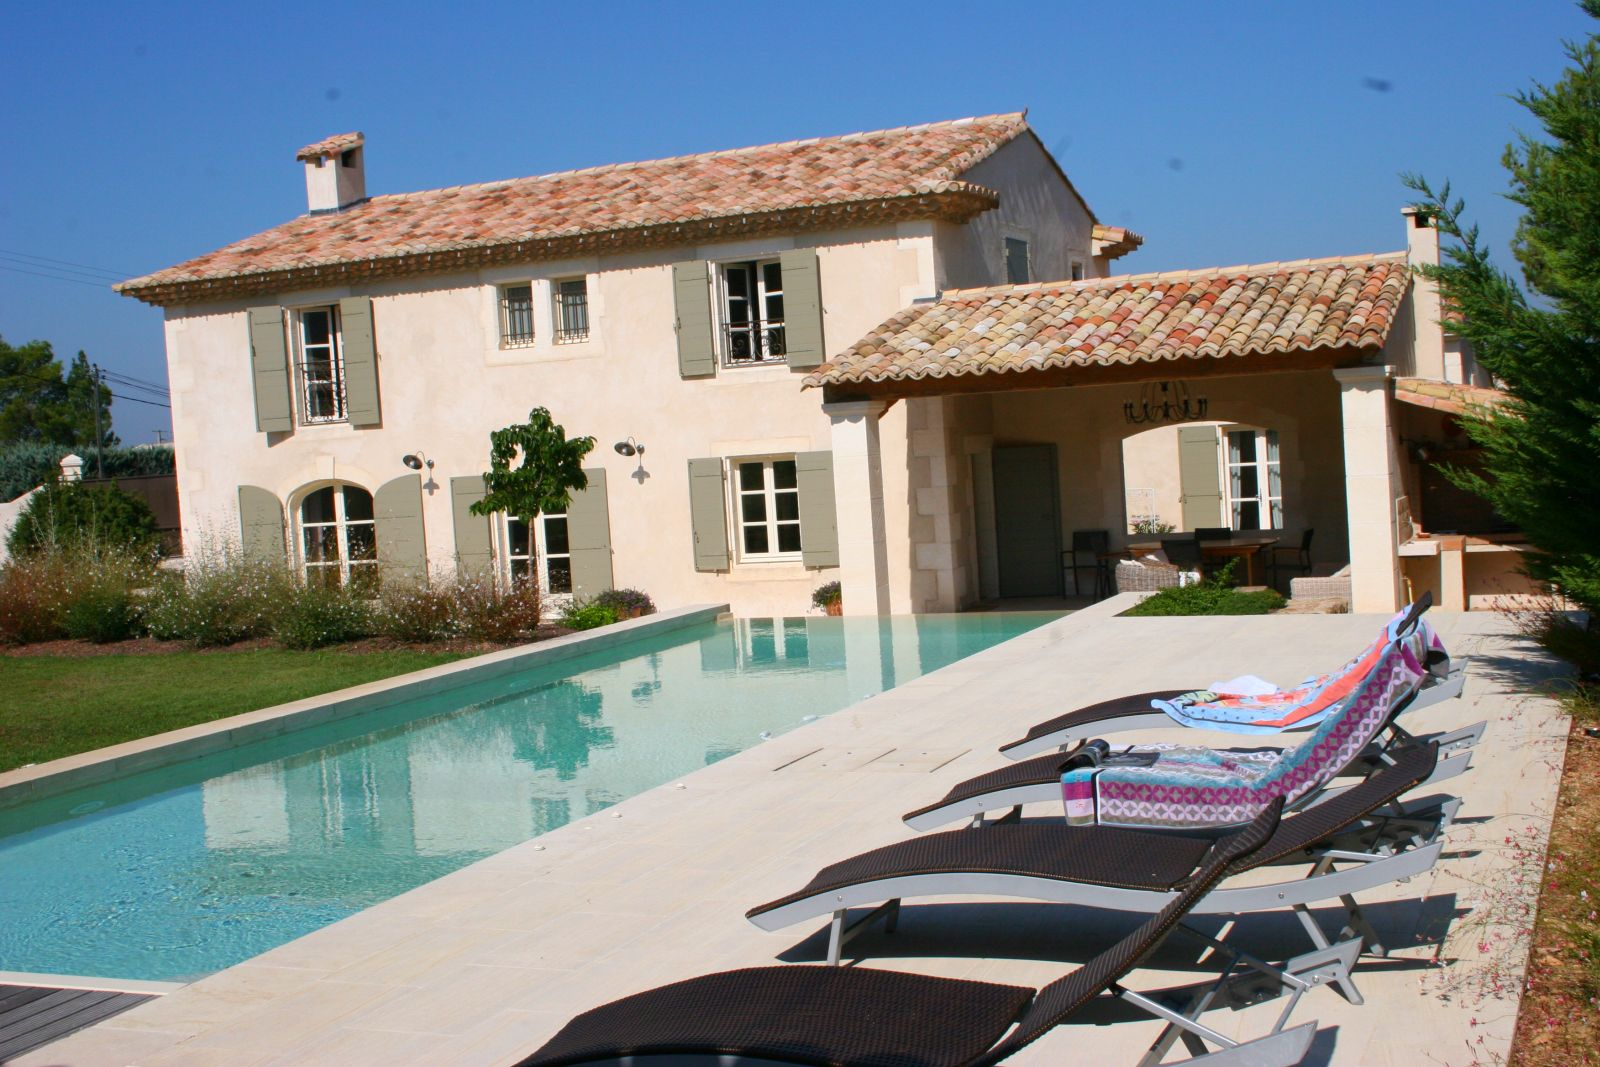 Location villa luxe saint remy de provence avec piscine privee - Villa piscine privee ...